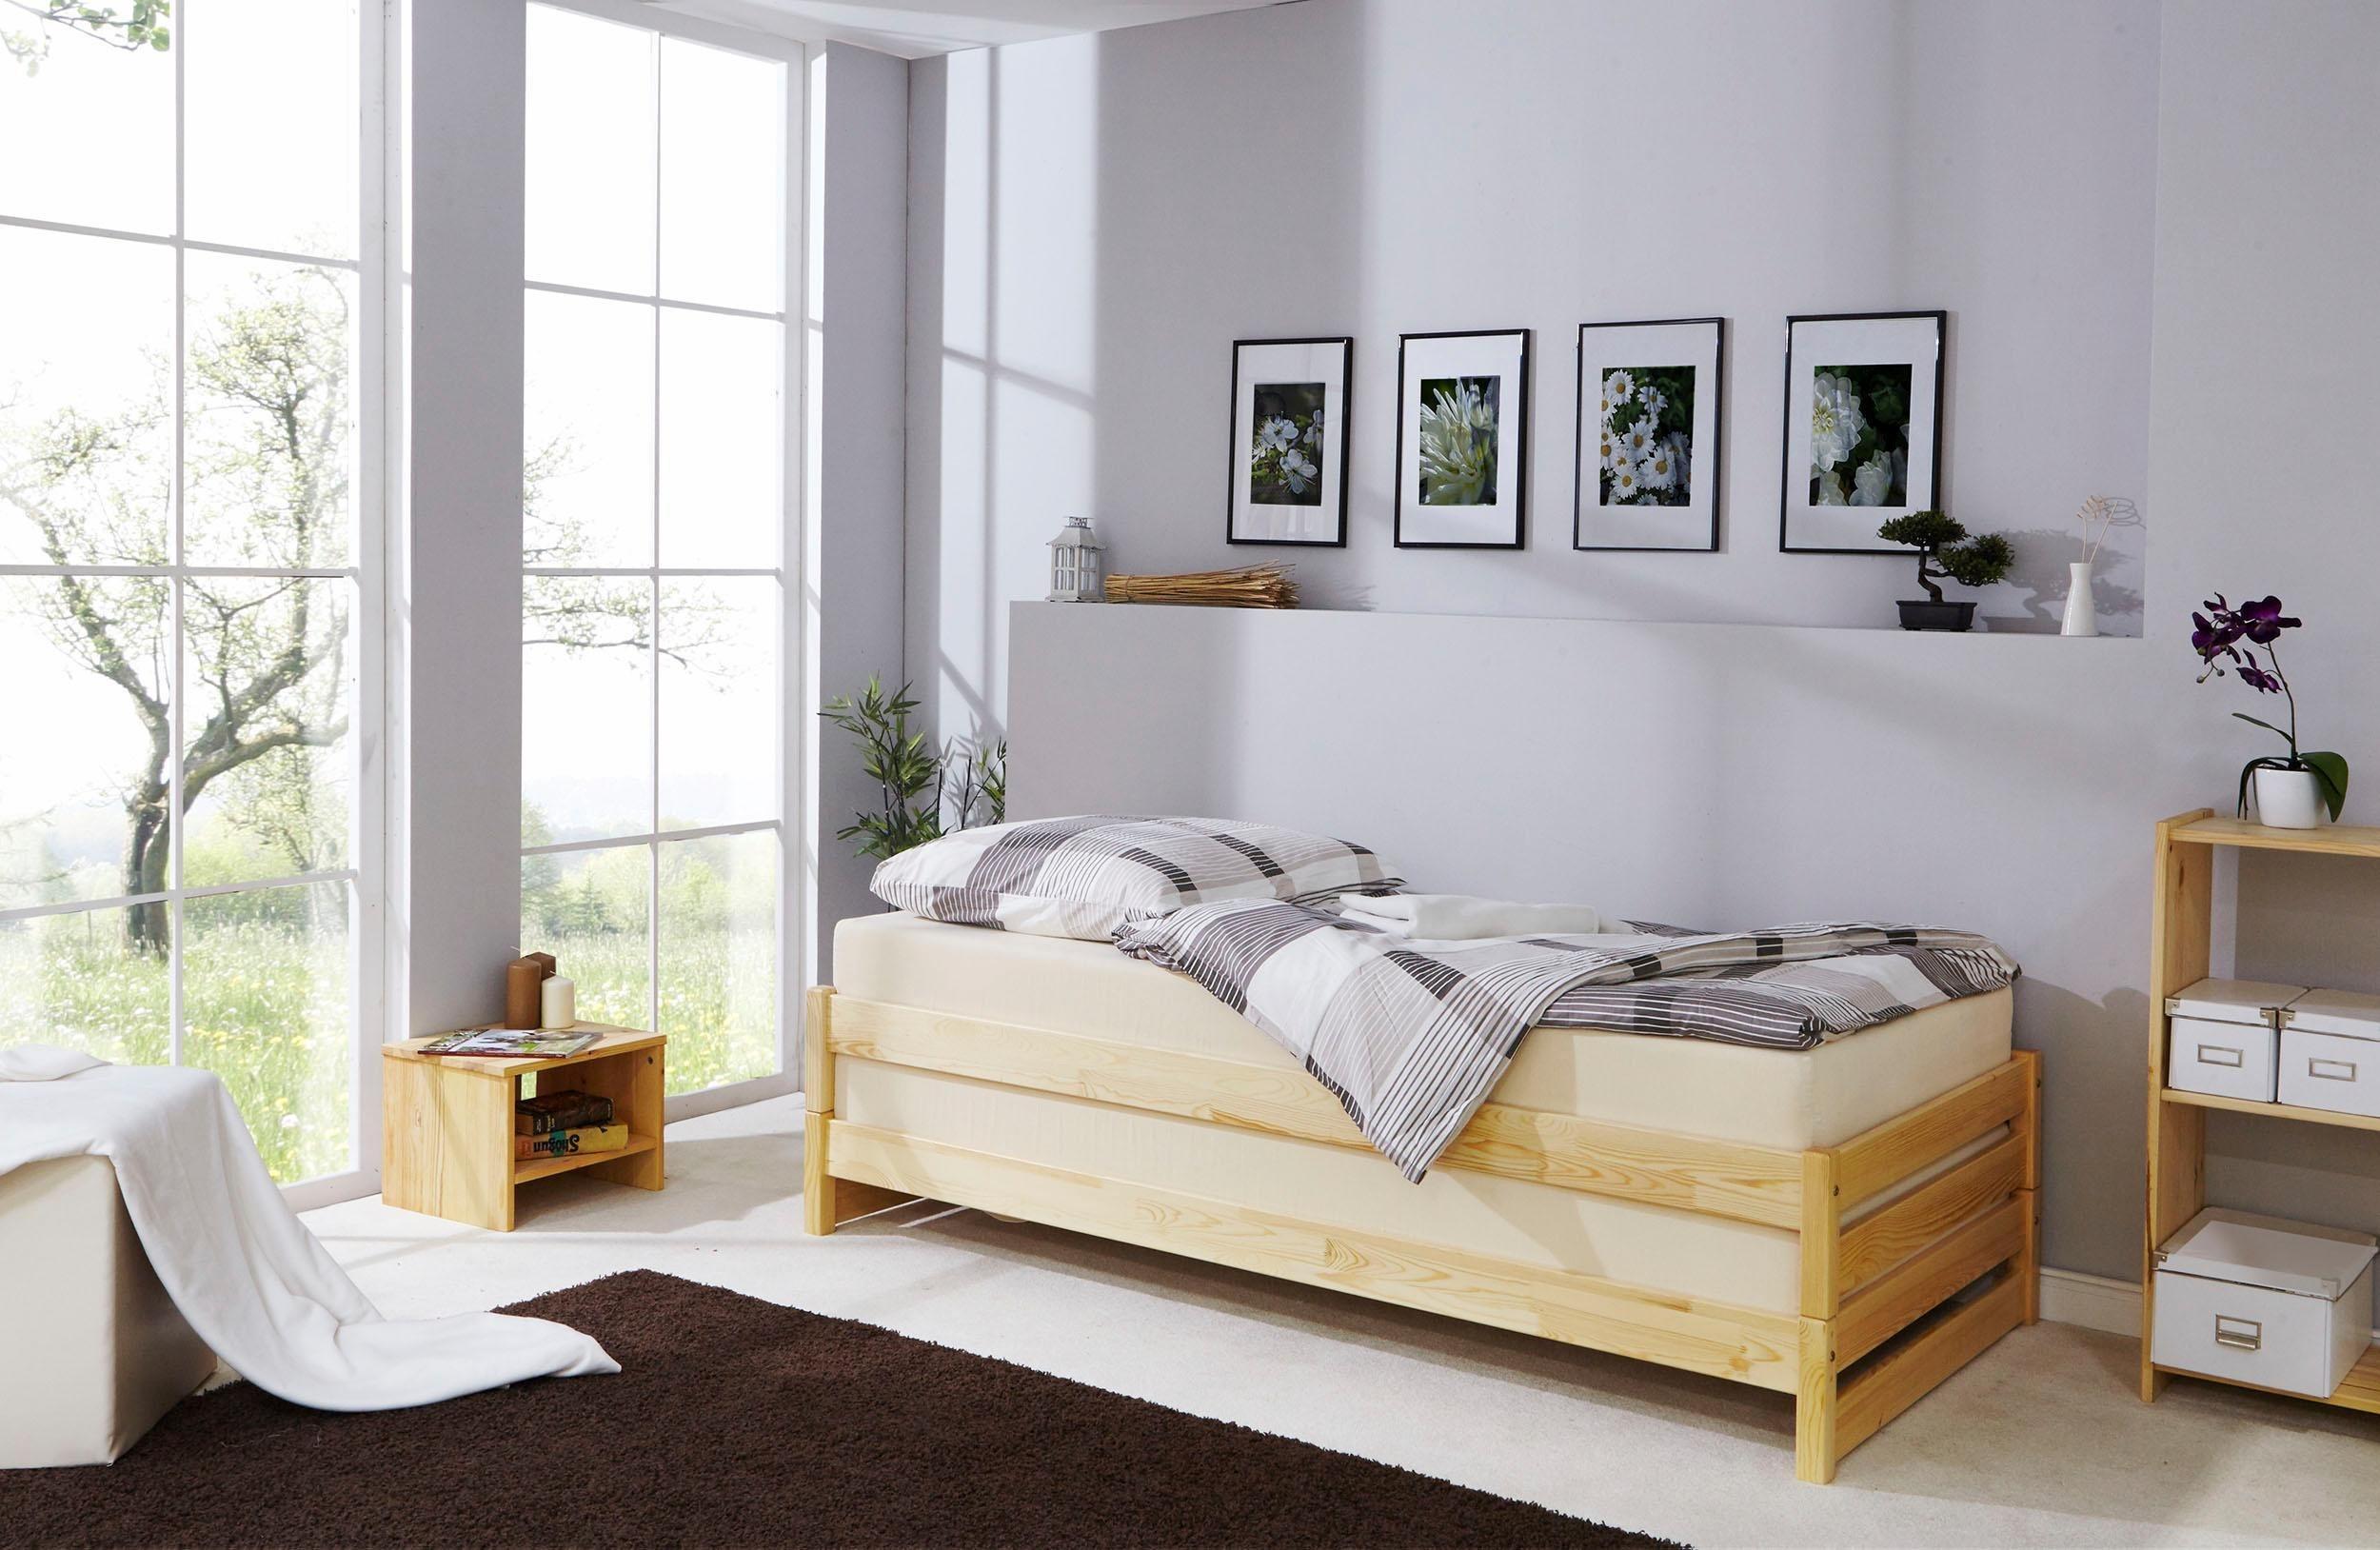 Ticaa Stapelliege mit Rollroste, Kiefer   Schlafzimmer > Lattenroste > Rollroste   Holz - Kiefer   Ticaa